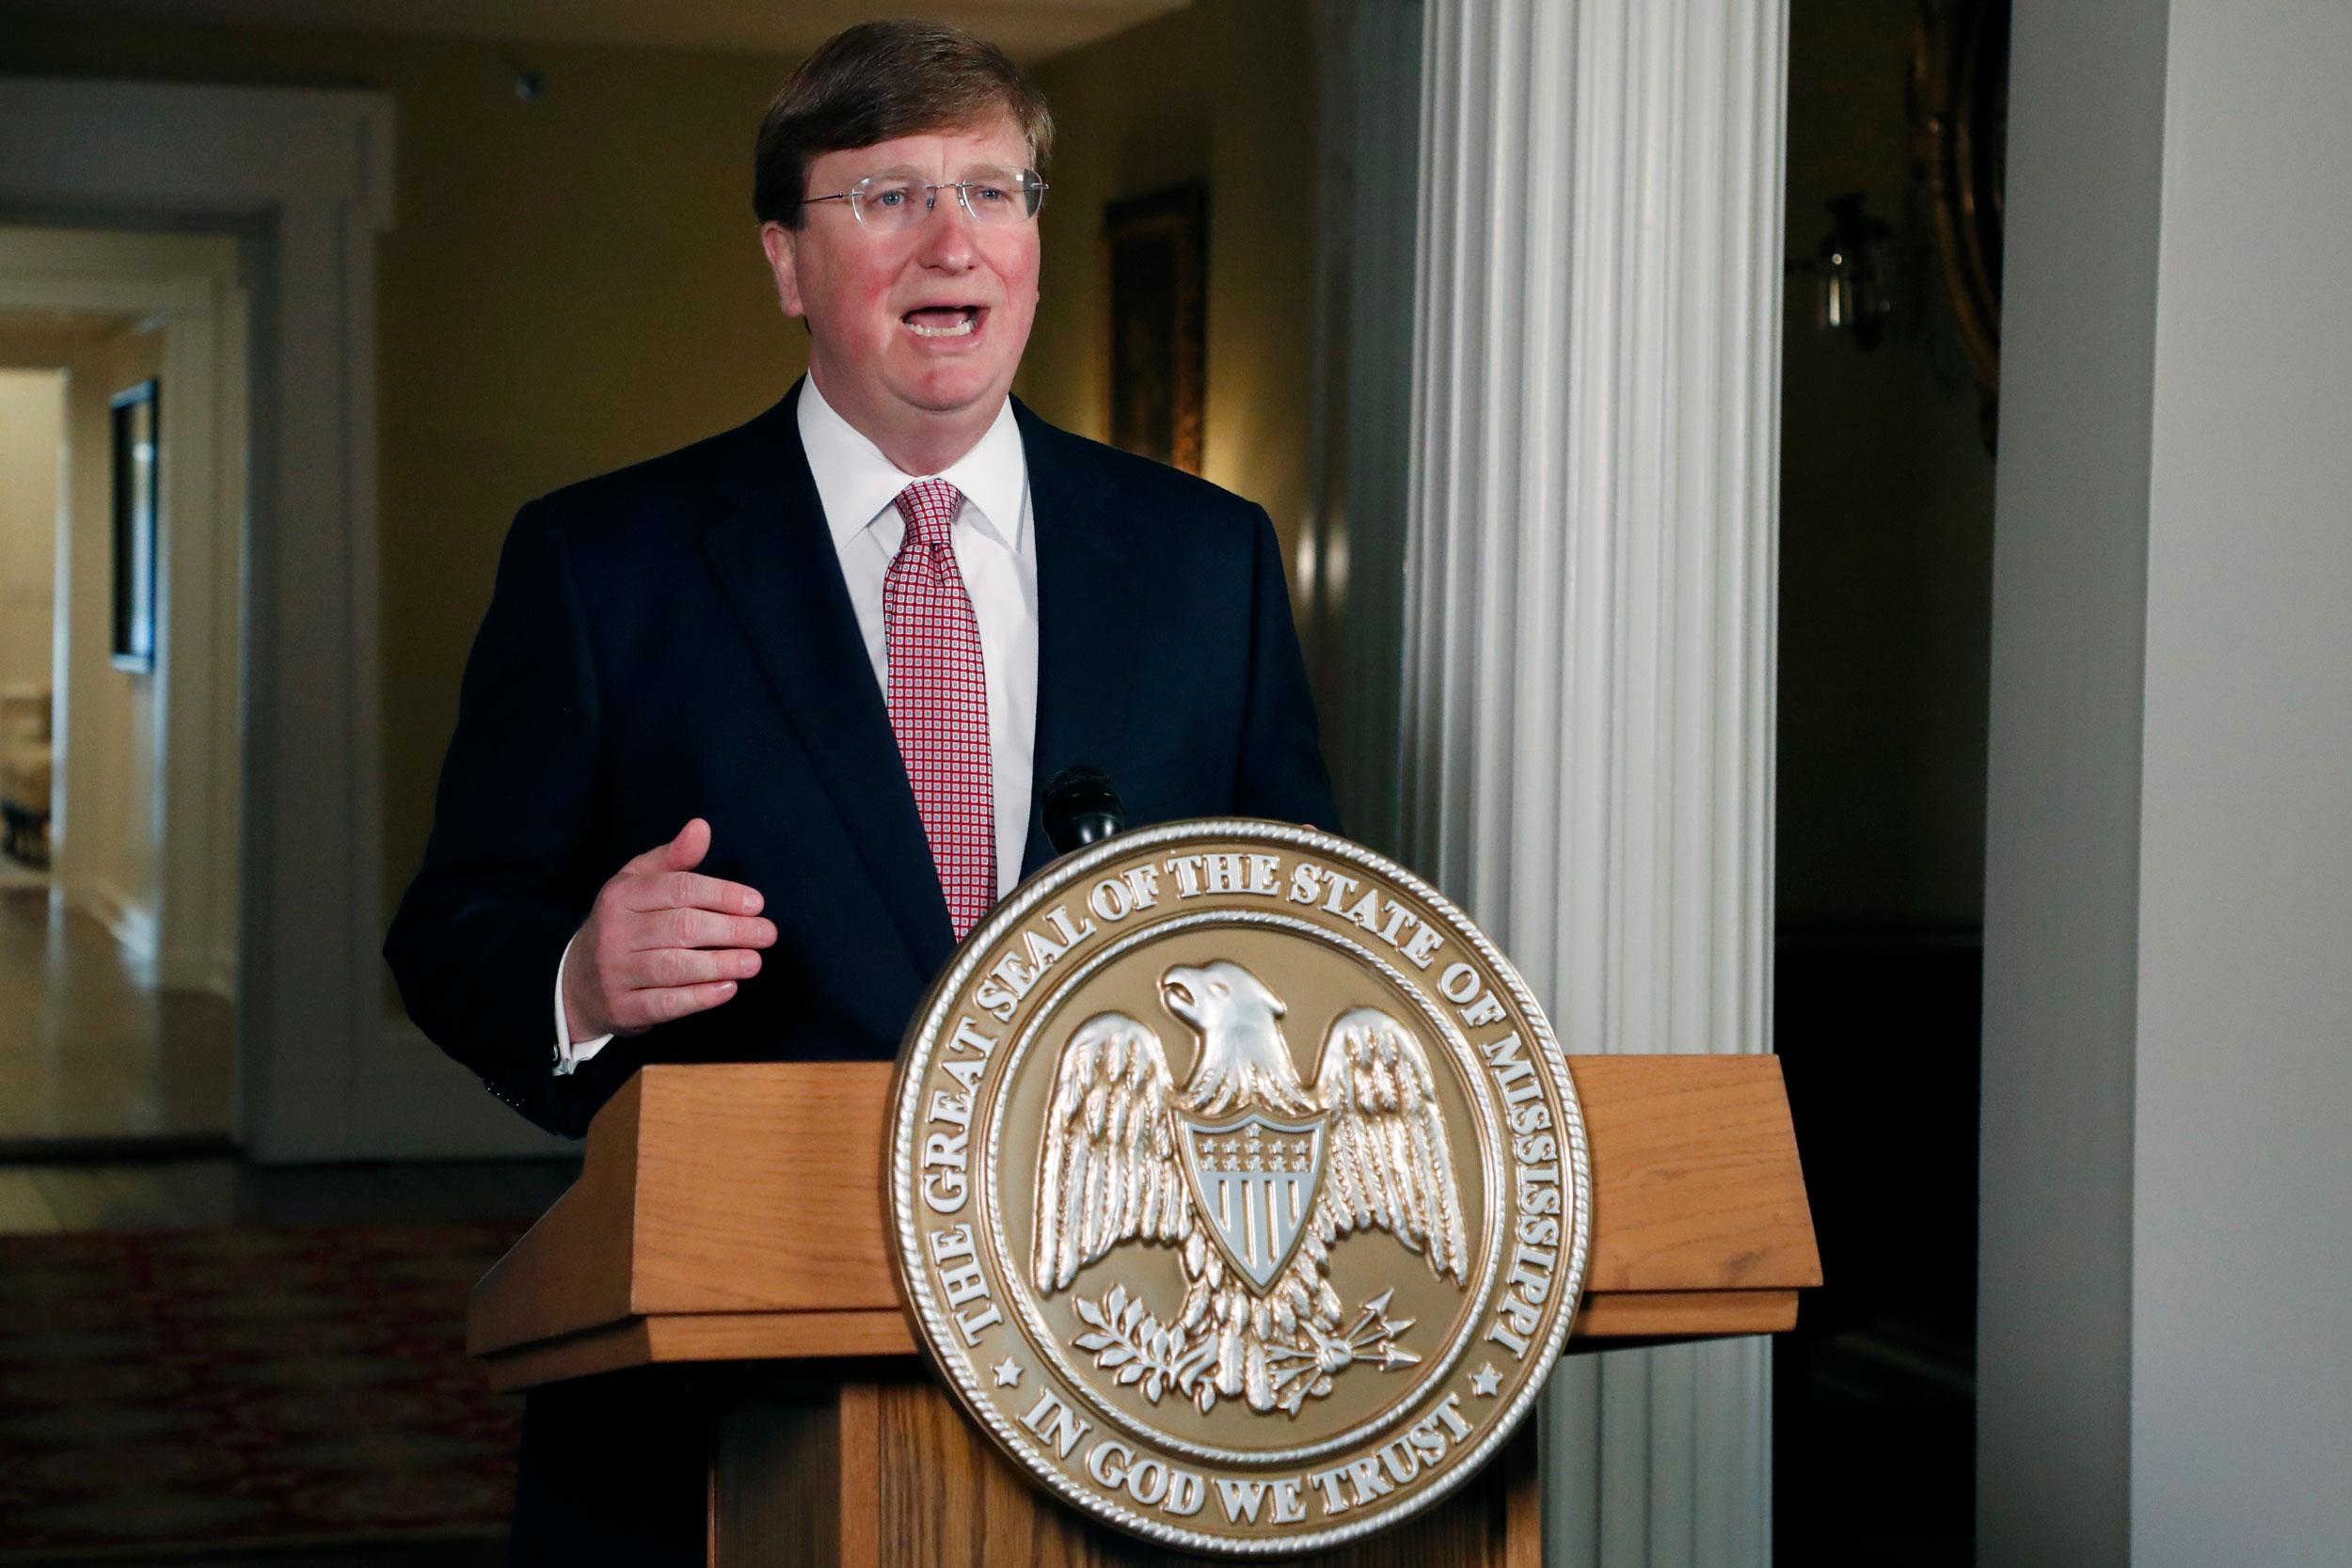 Mississippi Gov. Tate Reeves speaks during a televised address at the Governor's Mansion in Jackson, Mississippi, on June 30.